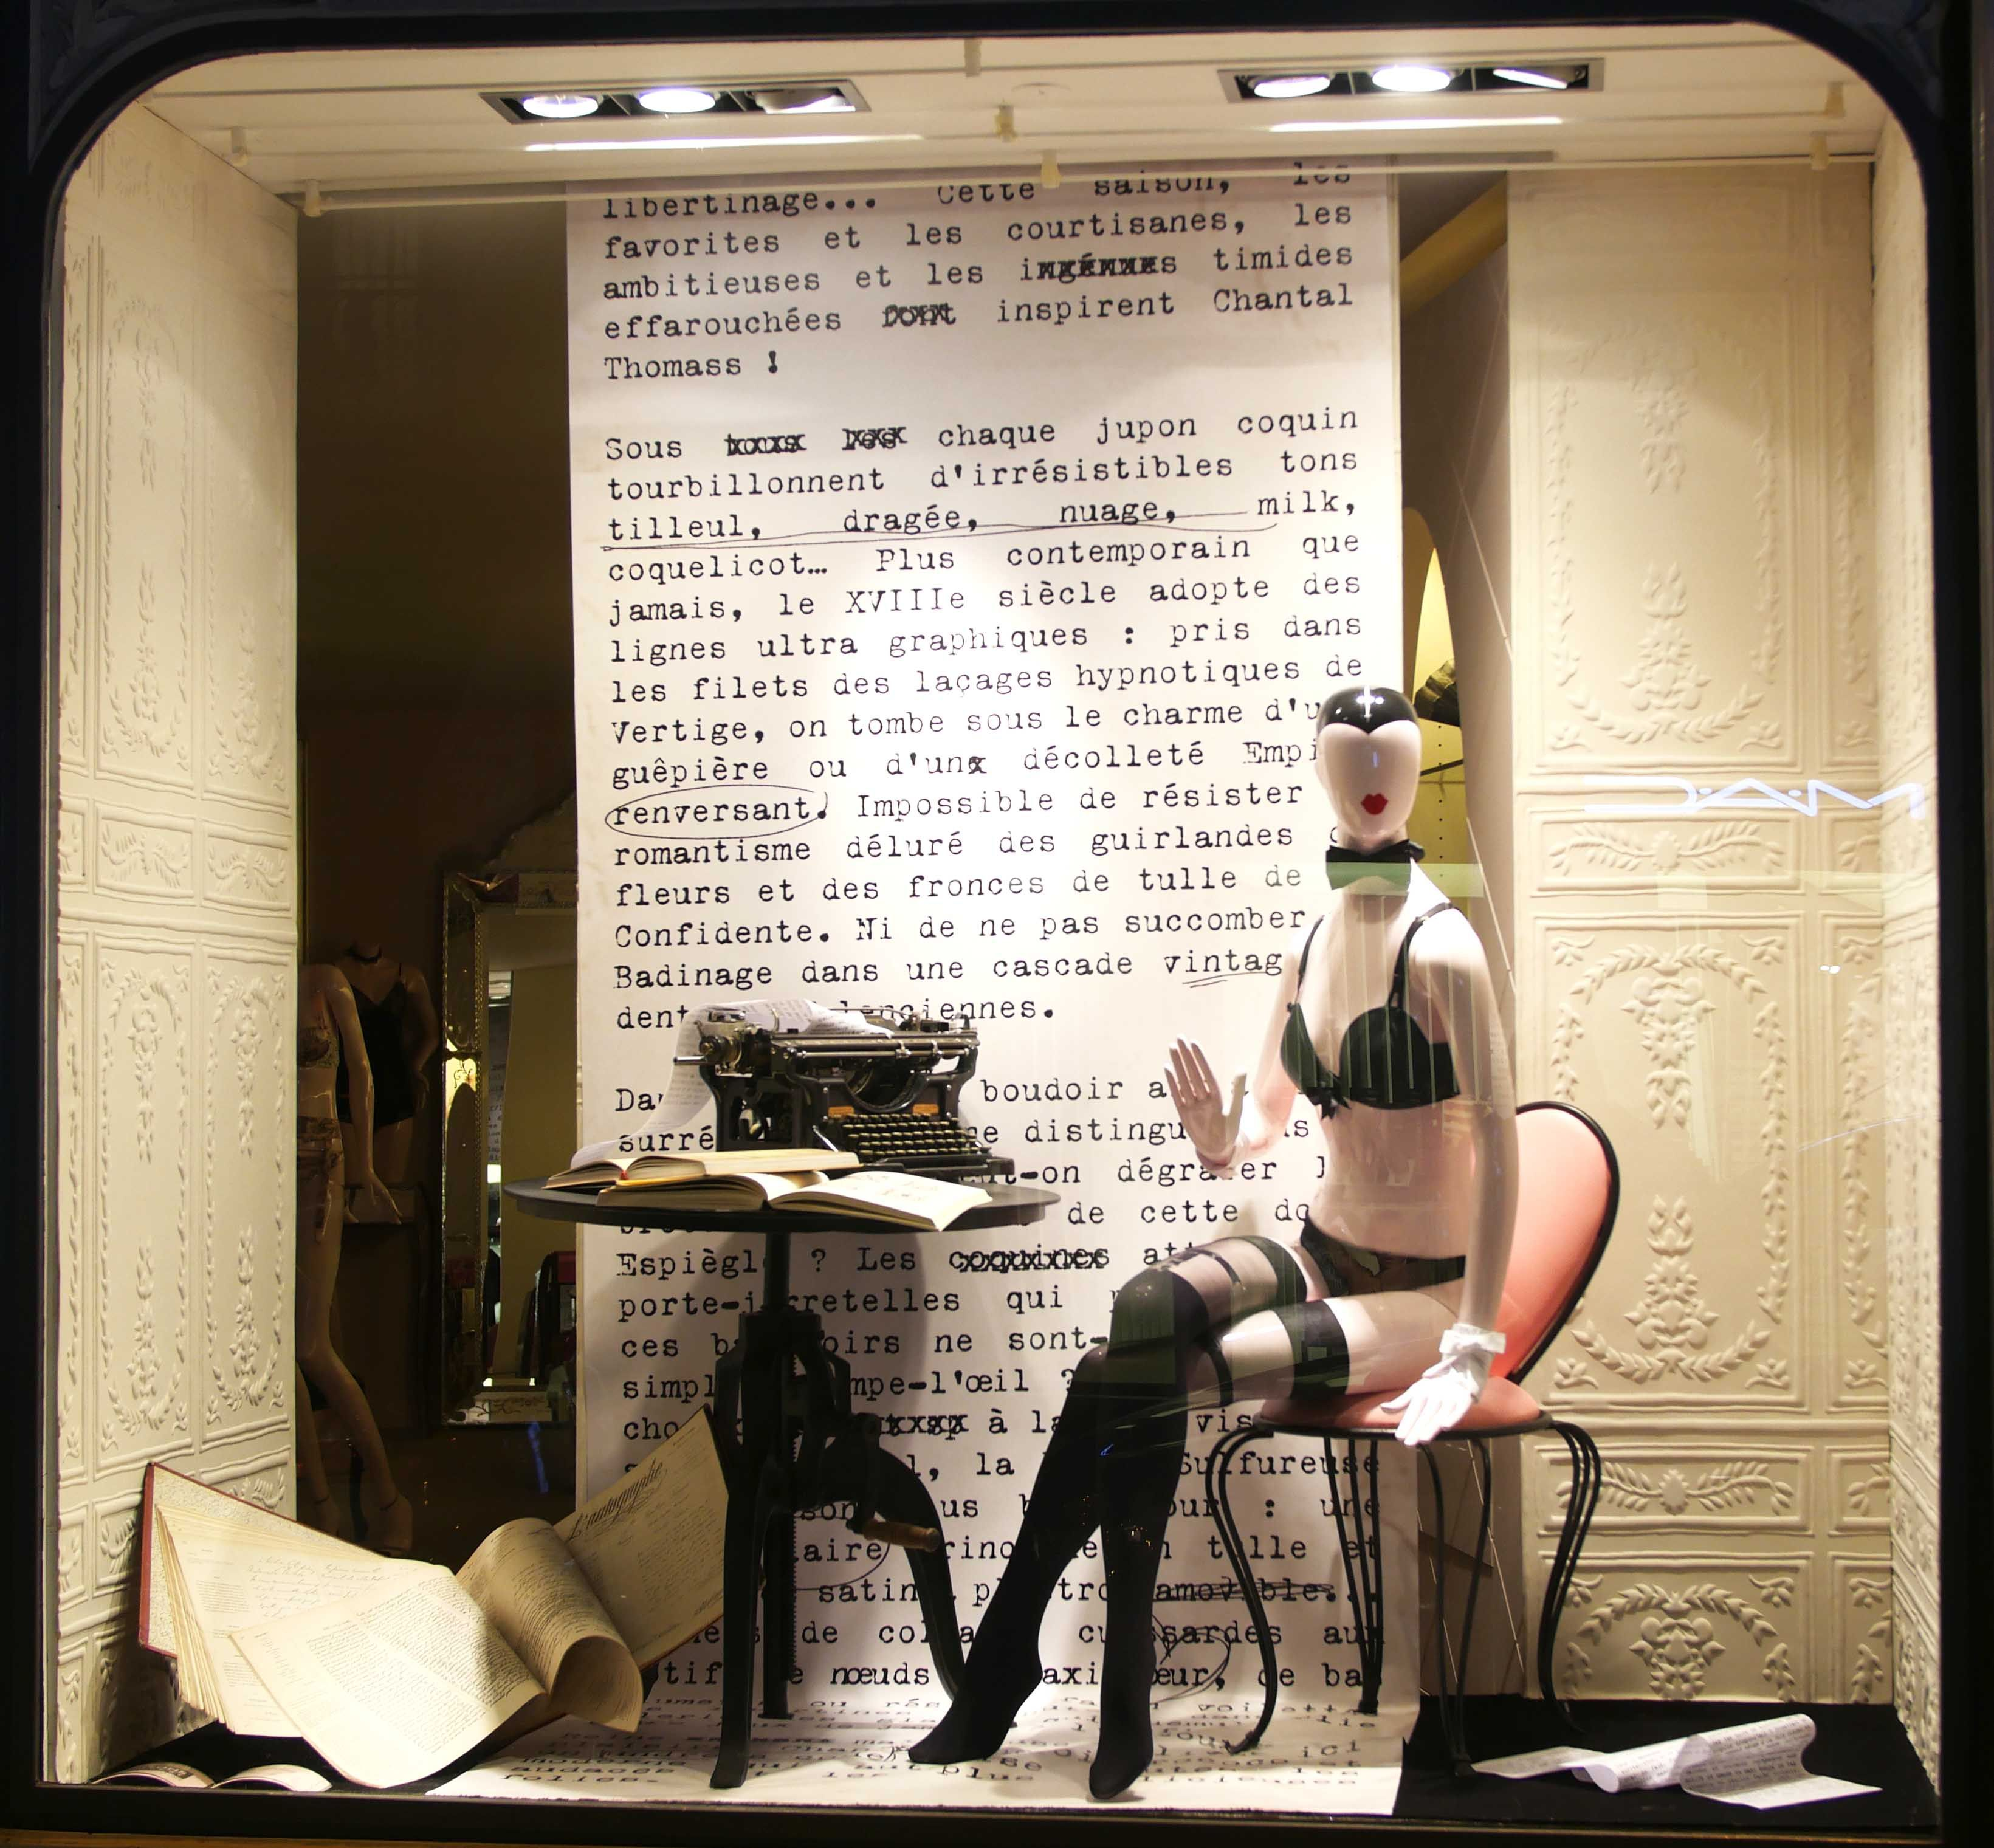 f vrier 2015 vitrine boutique chantal thomass 211 rue saint honor paris chantalthomass. Black Bedroom Furniture Sets. Home Design Ideas